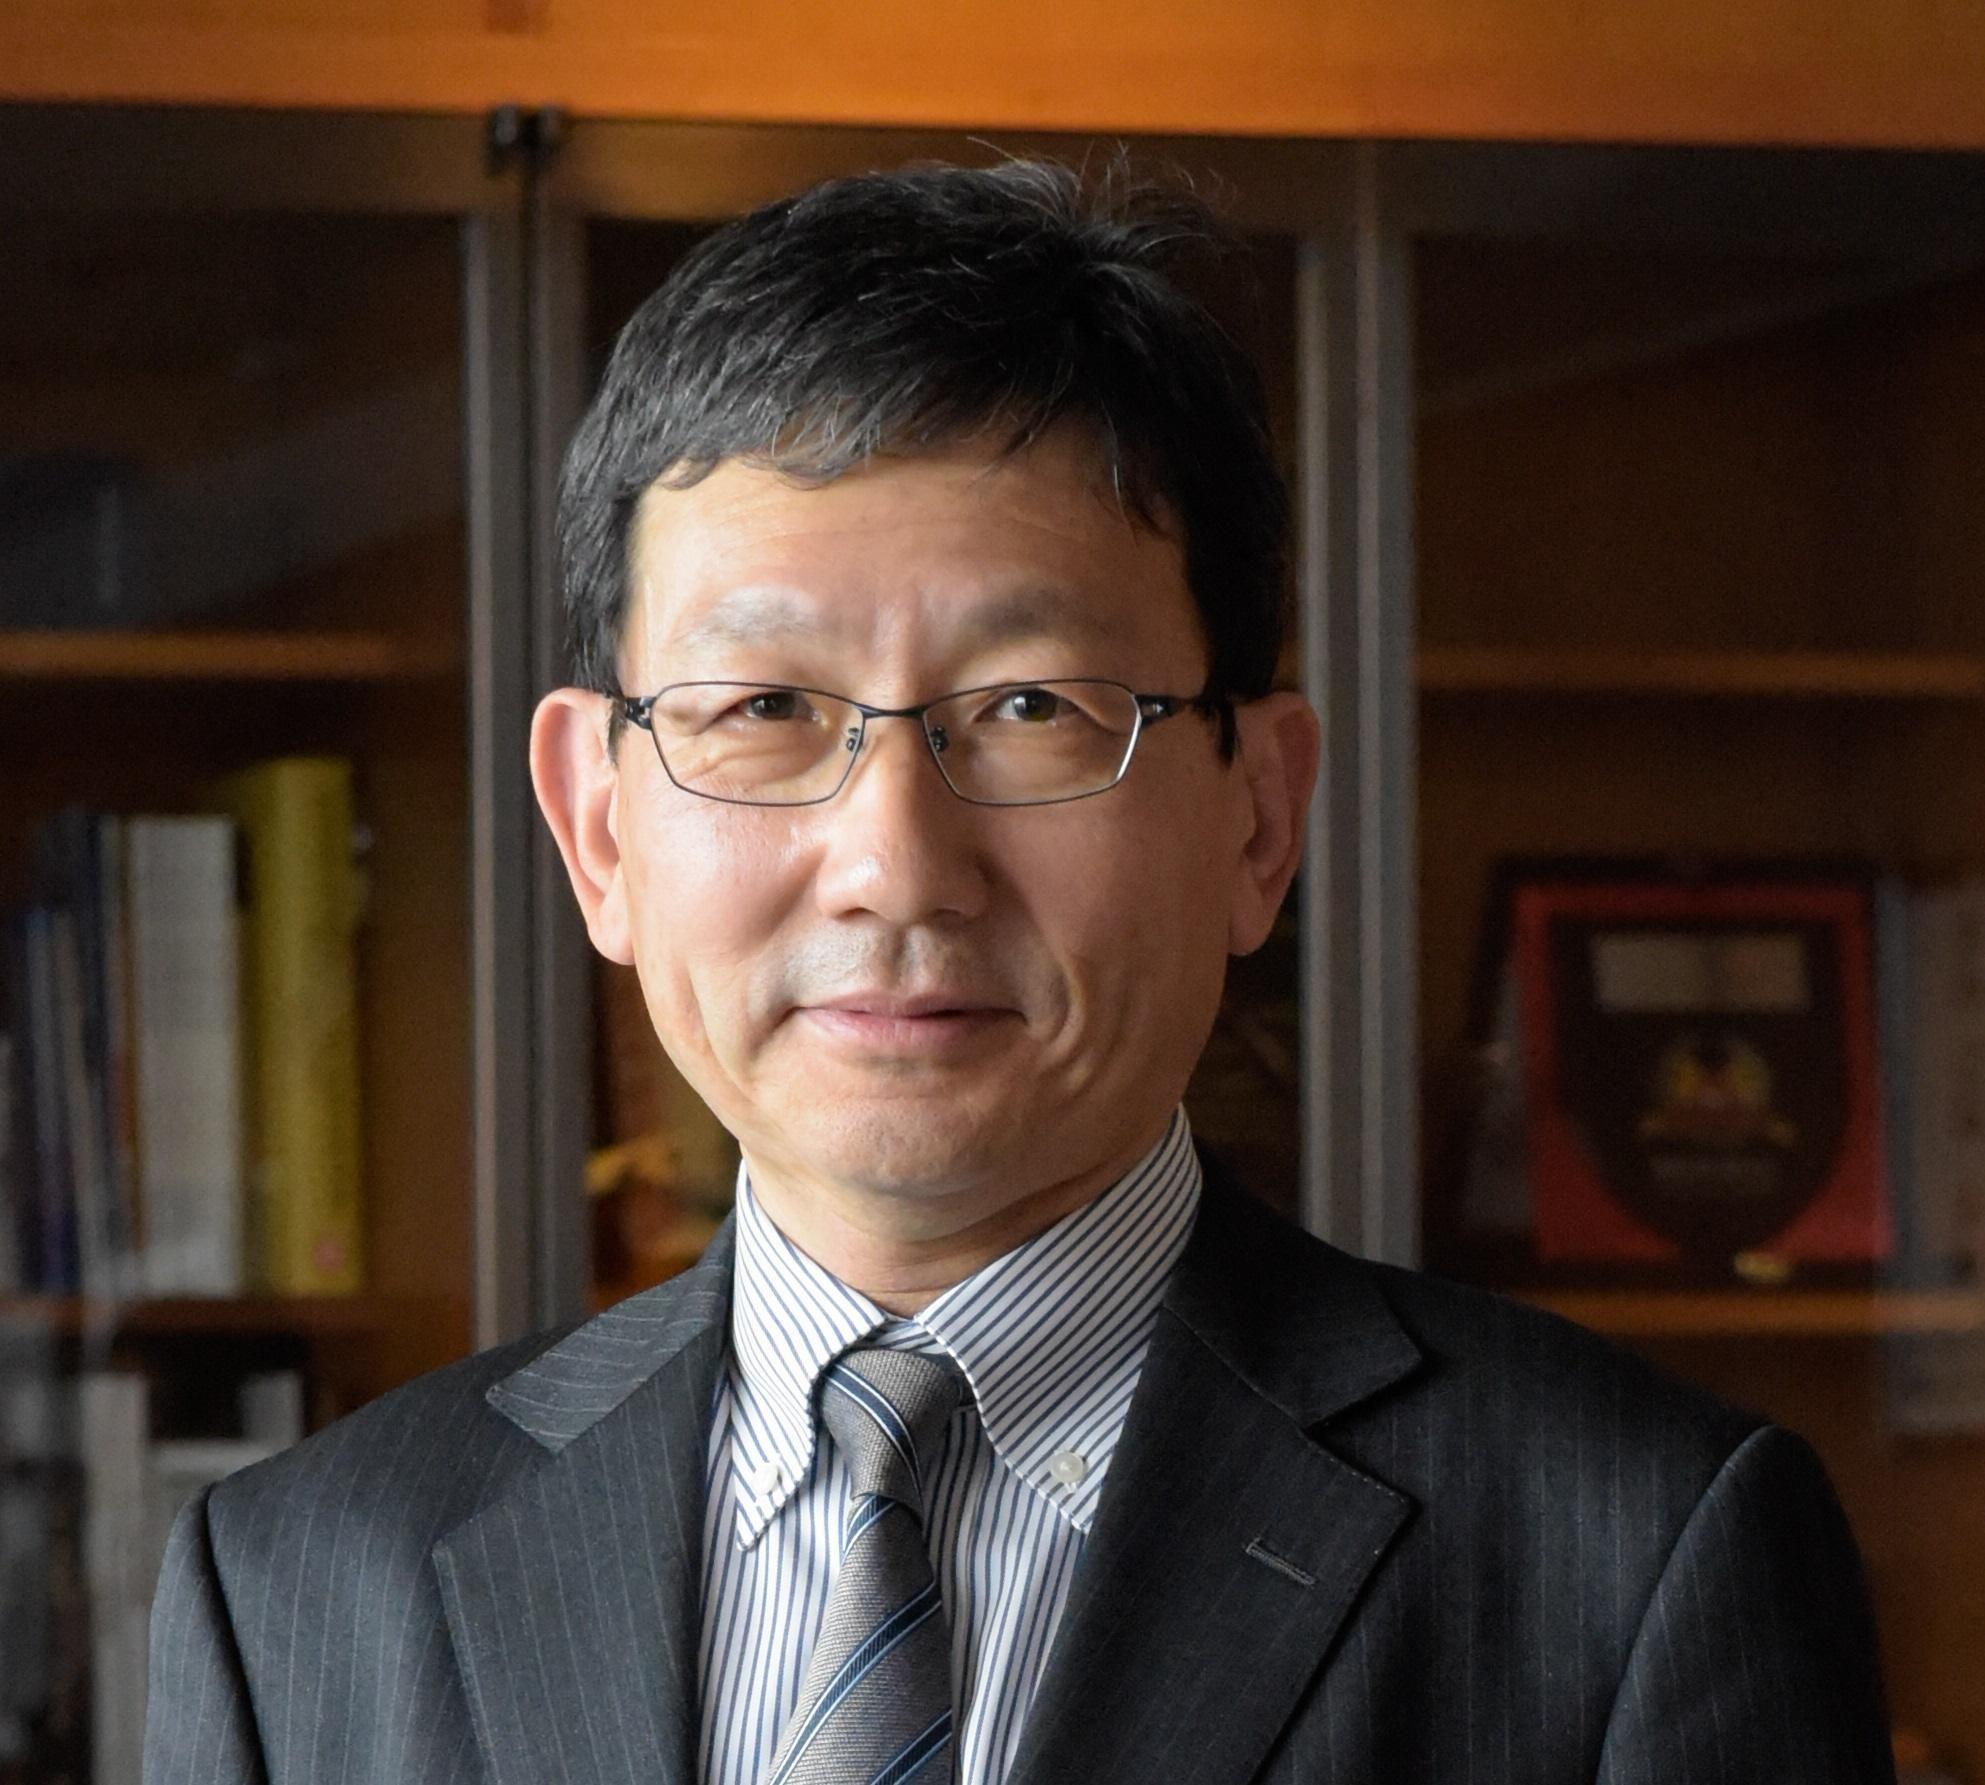 外園 博一 (Dr Hirokazu Hokazono)